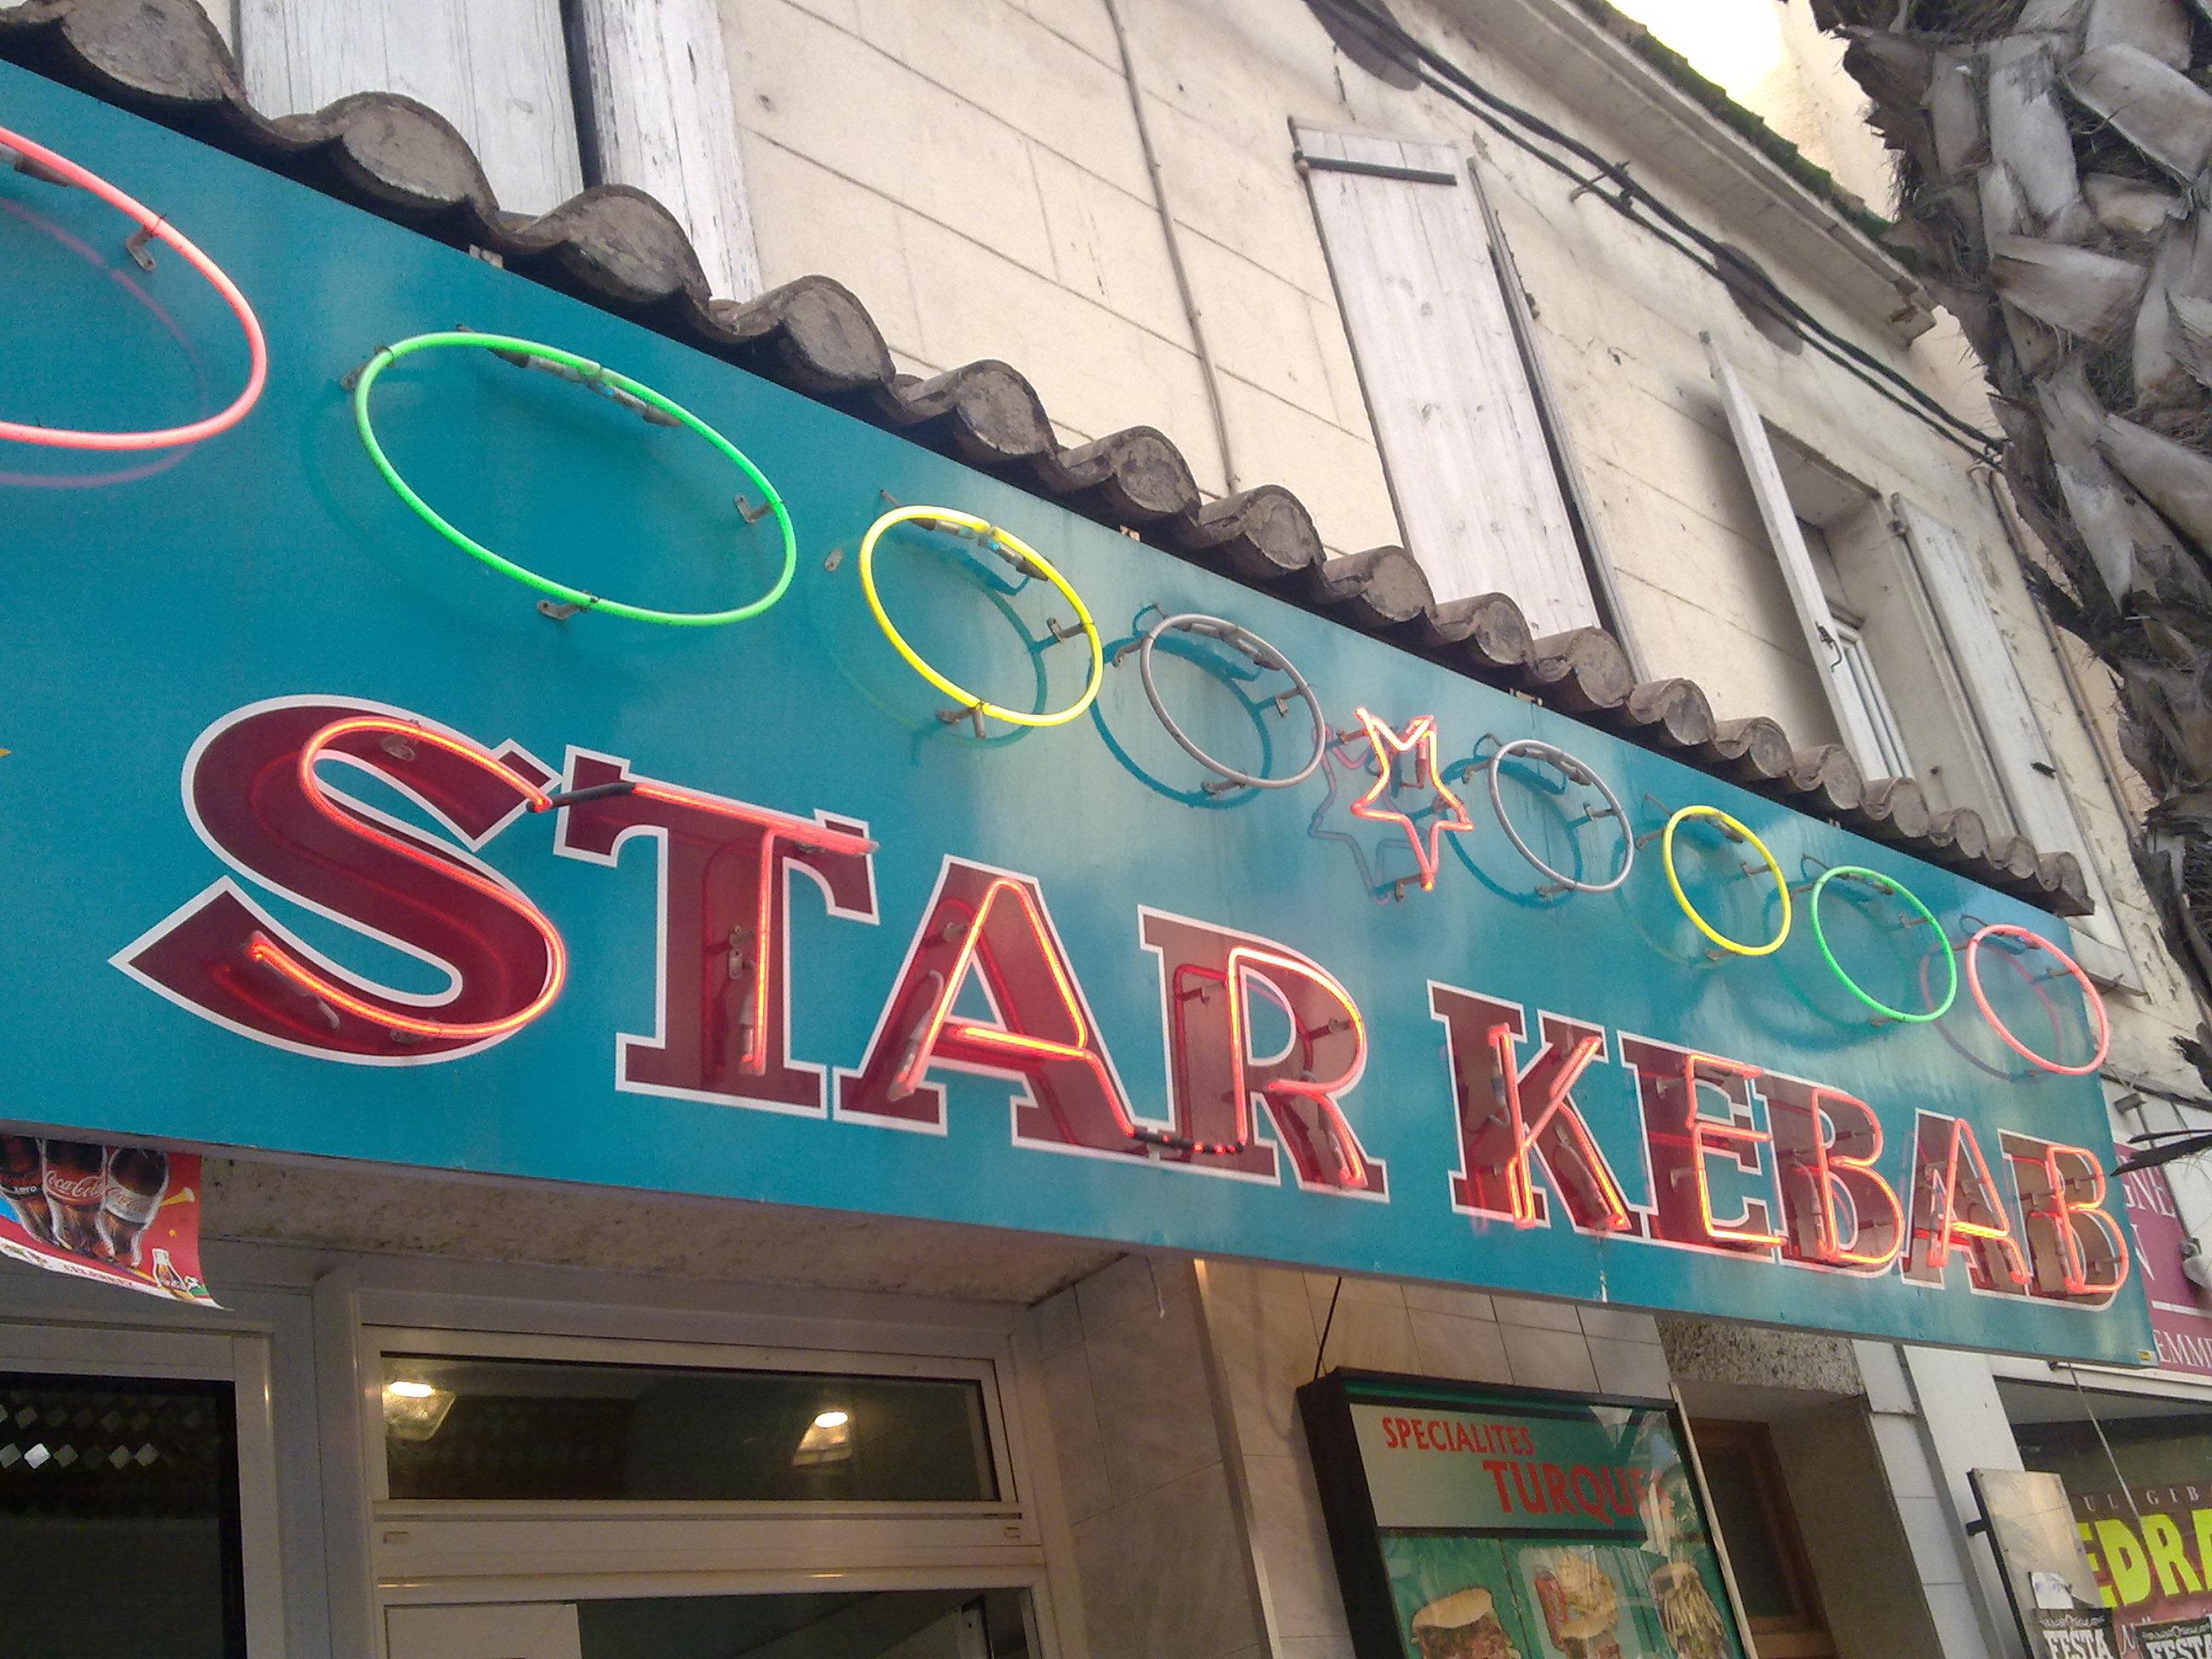 Star d'or kebab